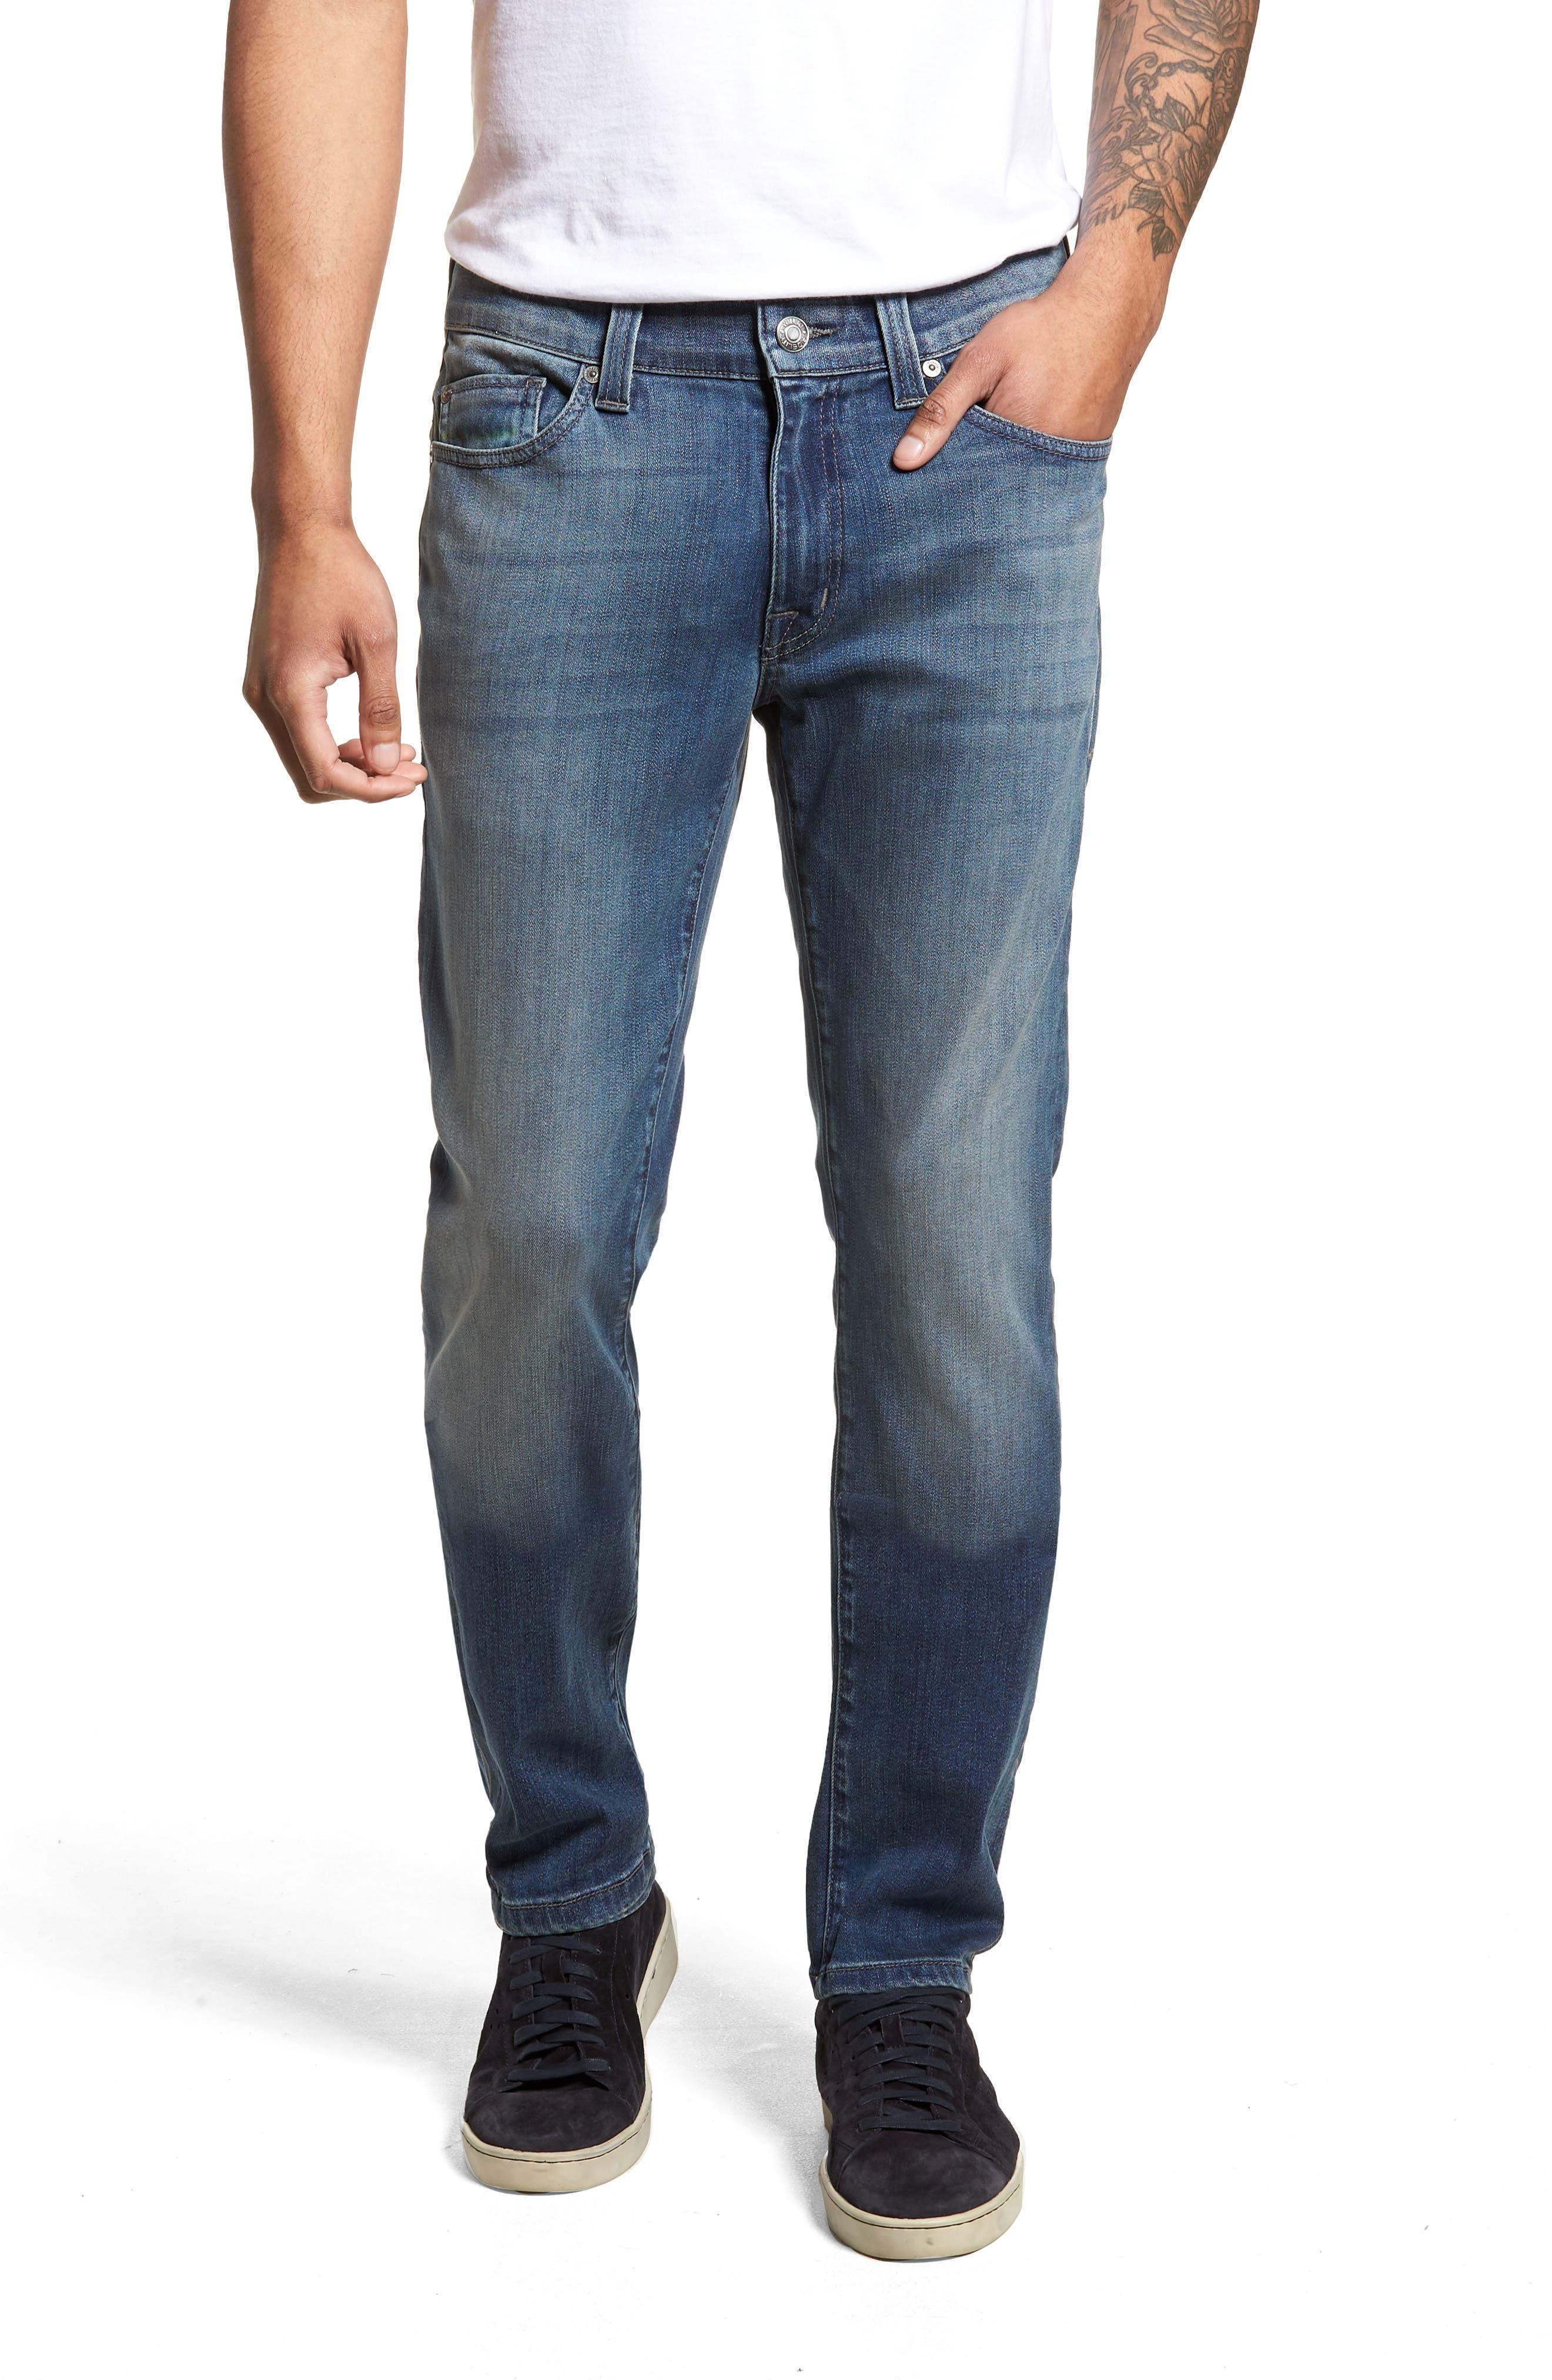 FIDELITY DENIM,                             Torino Slim Fit Jeans,                             Main thumbnail 1, color,                             400